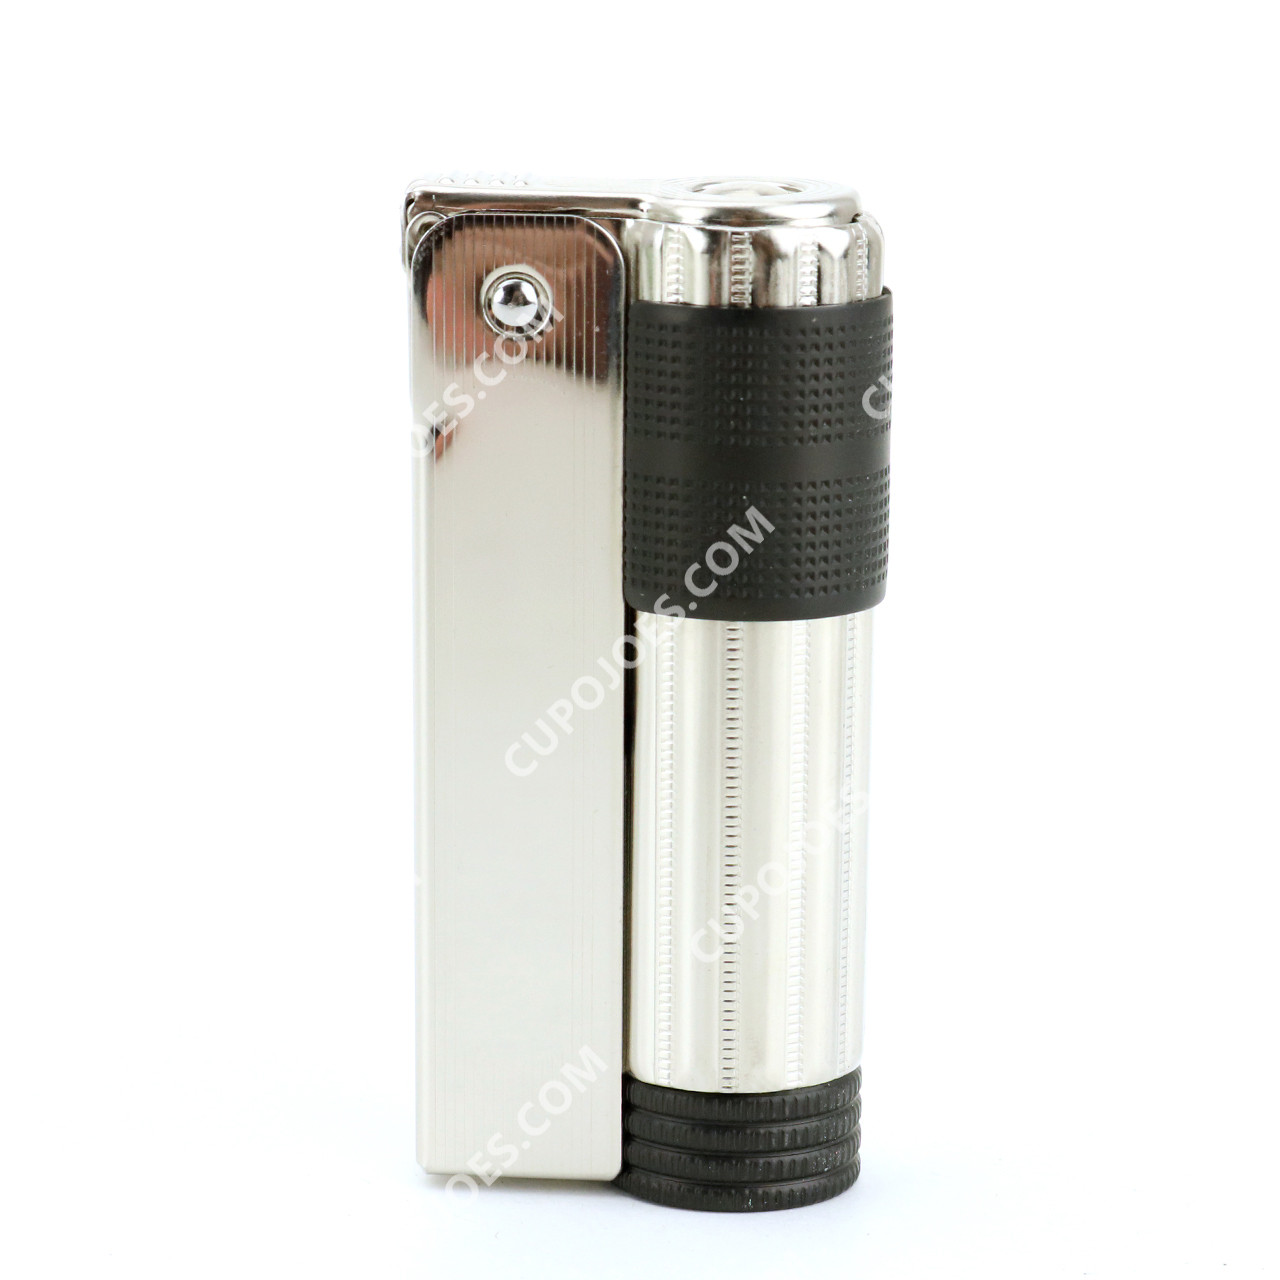 Imco Super Classic Trench Lighter Black